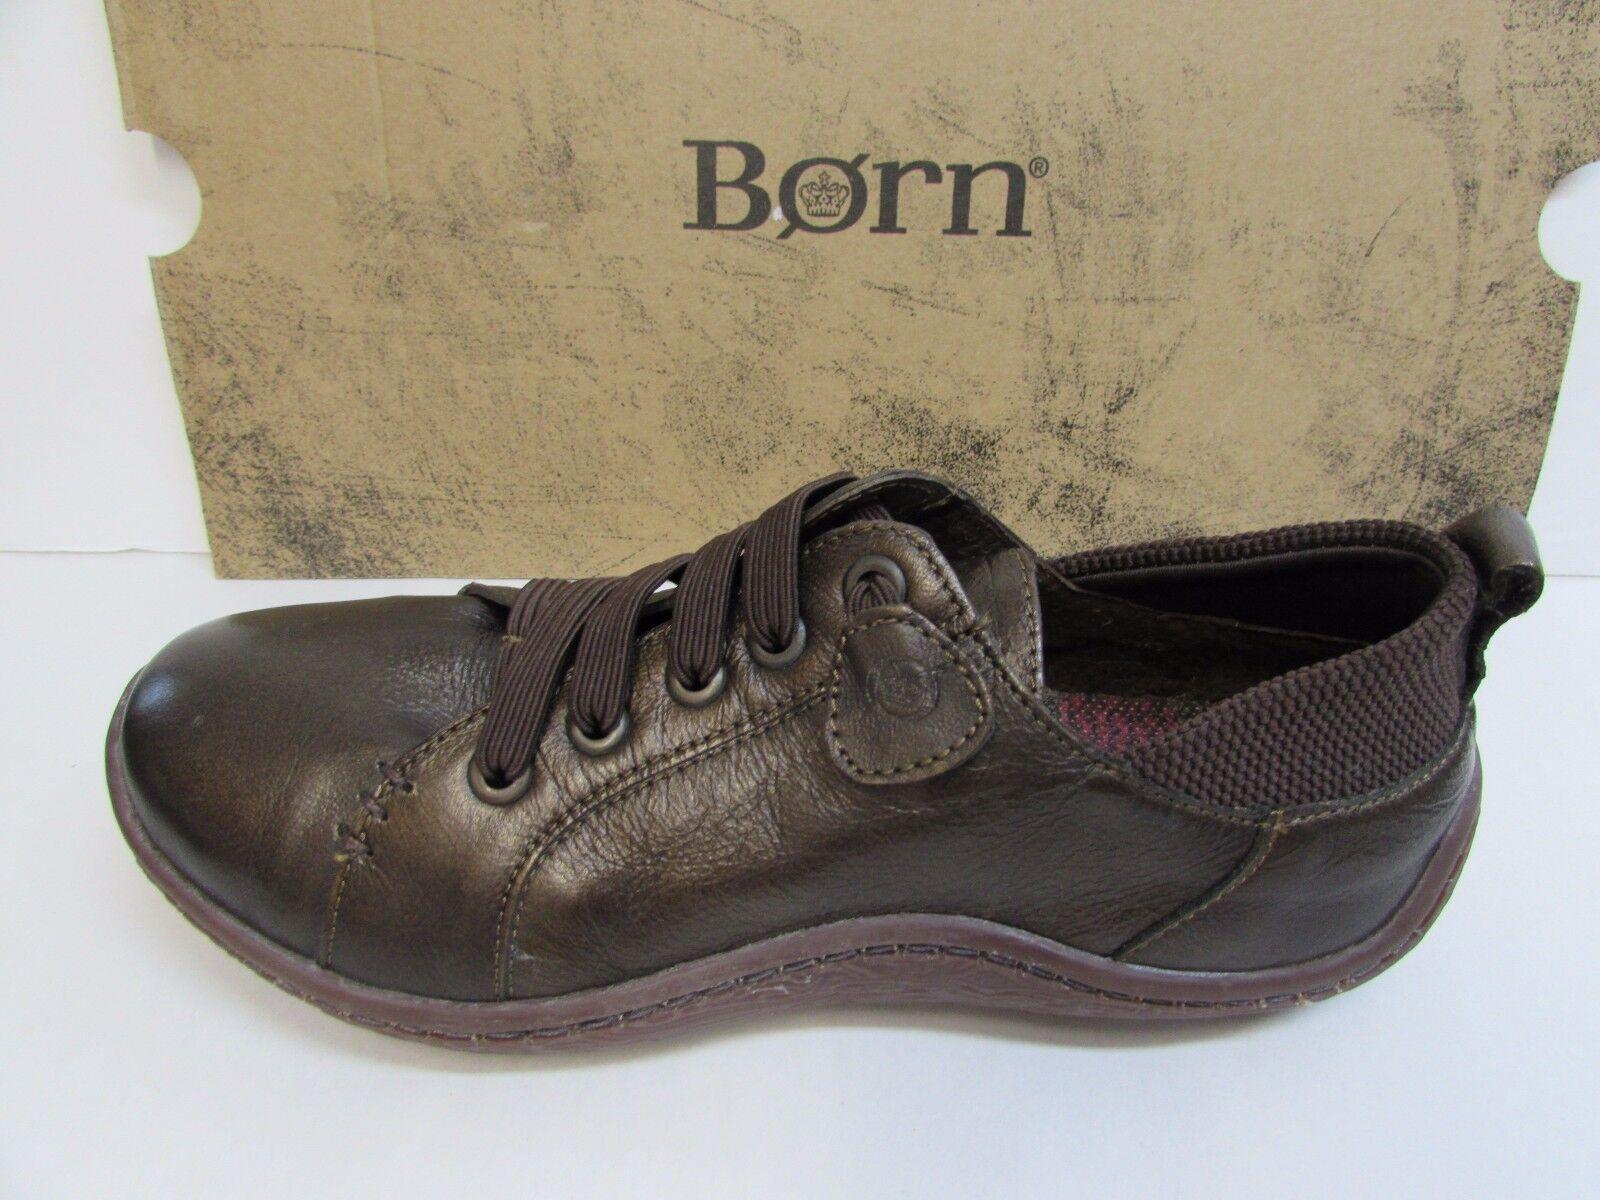 Born Größe 6.5 Braun Lace Up NEU Damenschuhe Schuhes